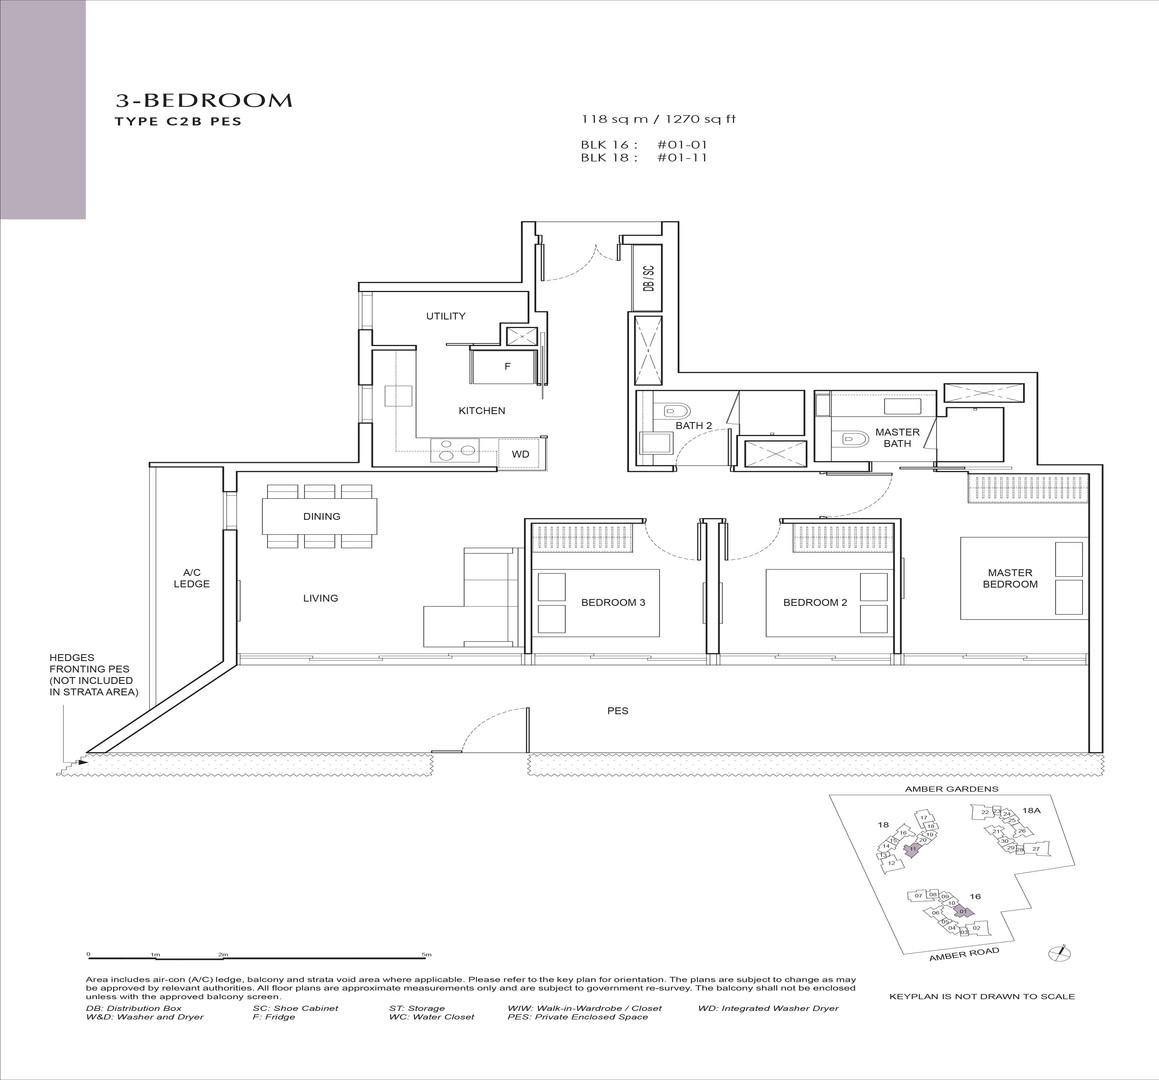 3-Bedroom_TypeC2B PES.jpg